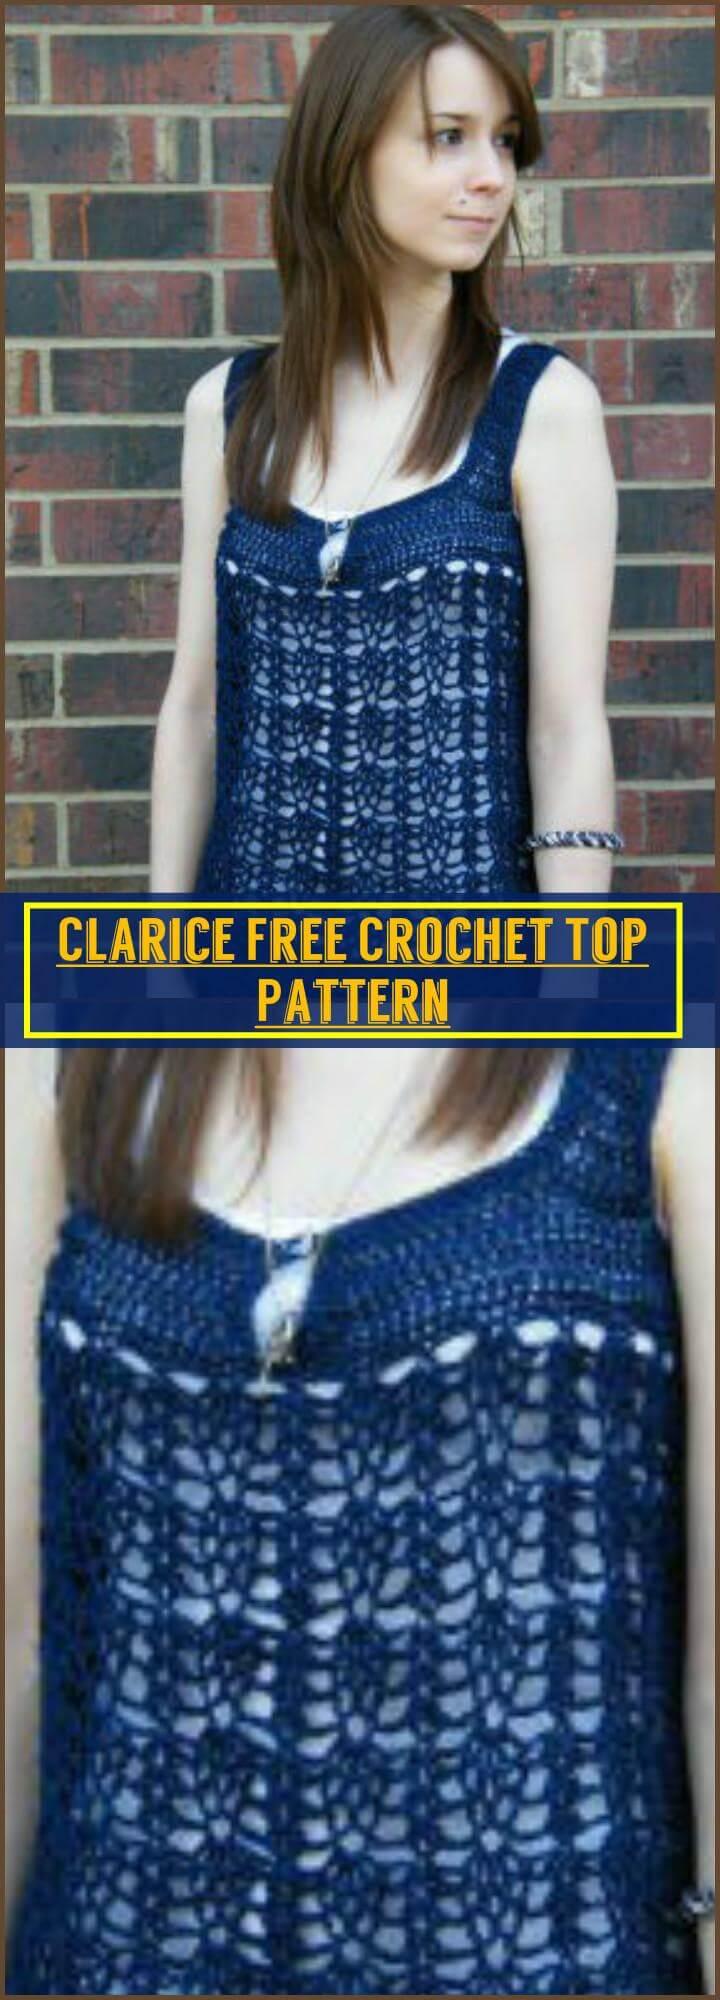 Clarice Free Crochet Top Pattern